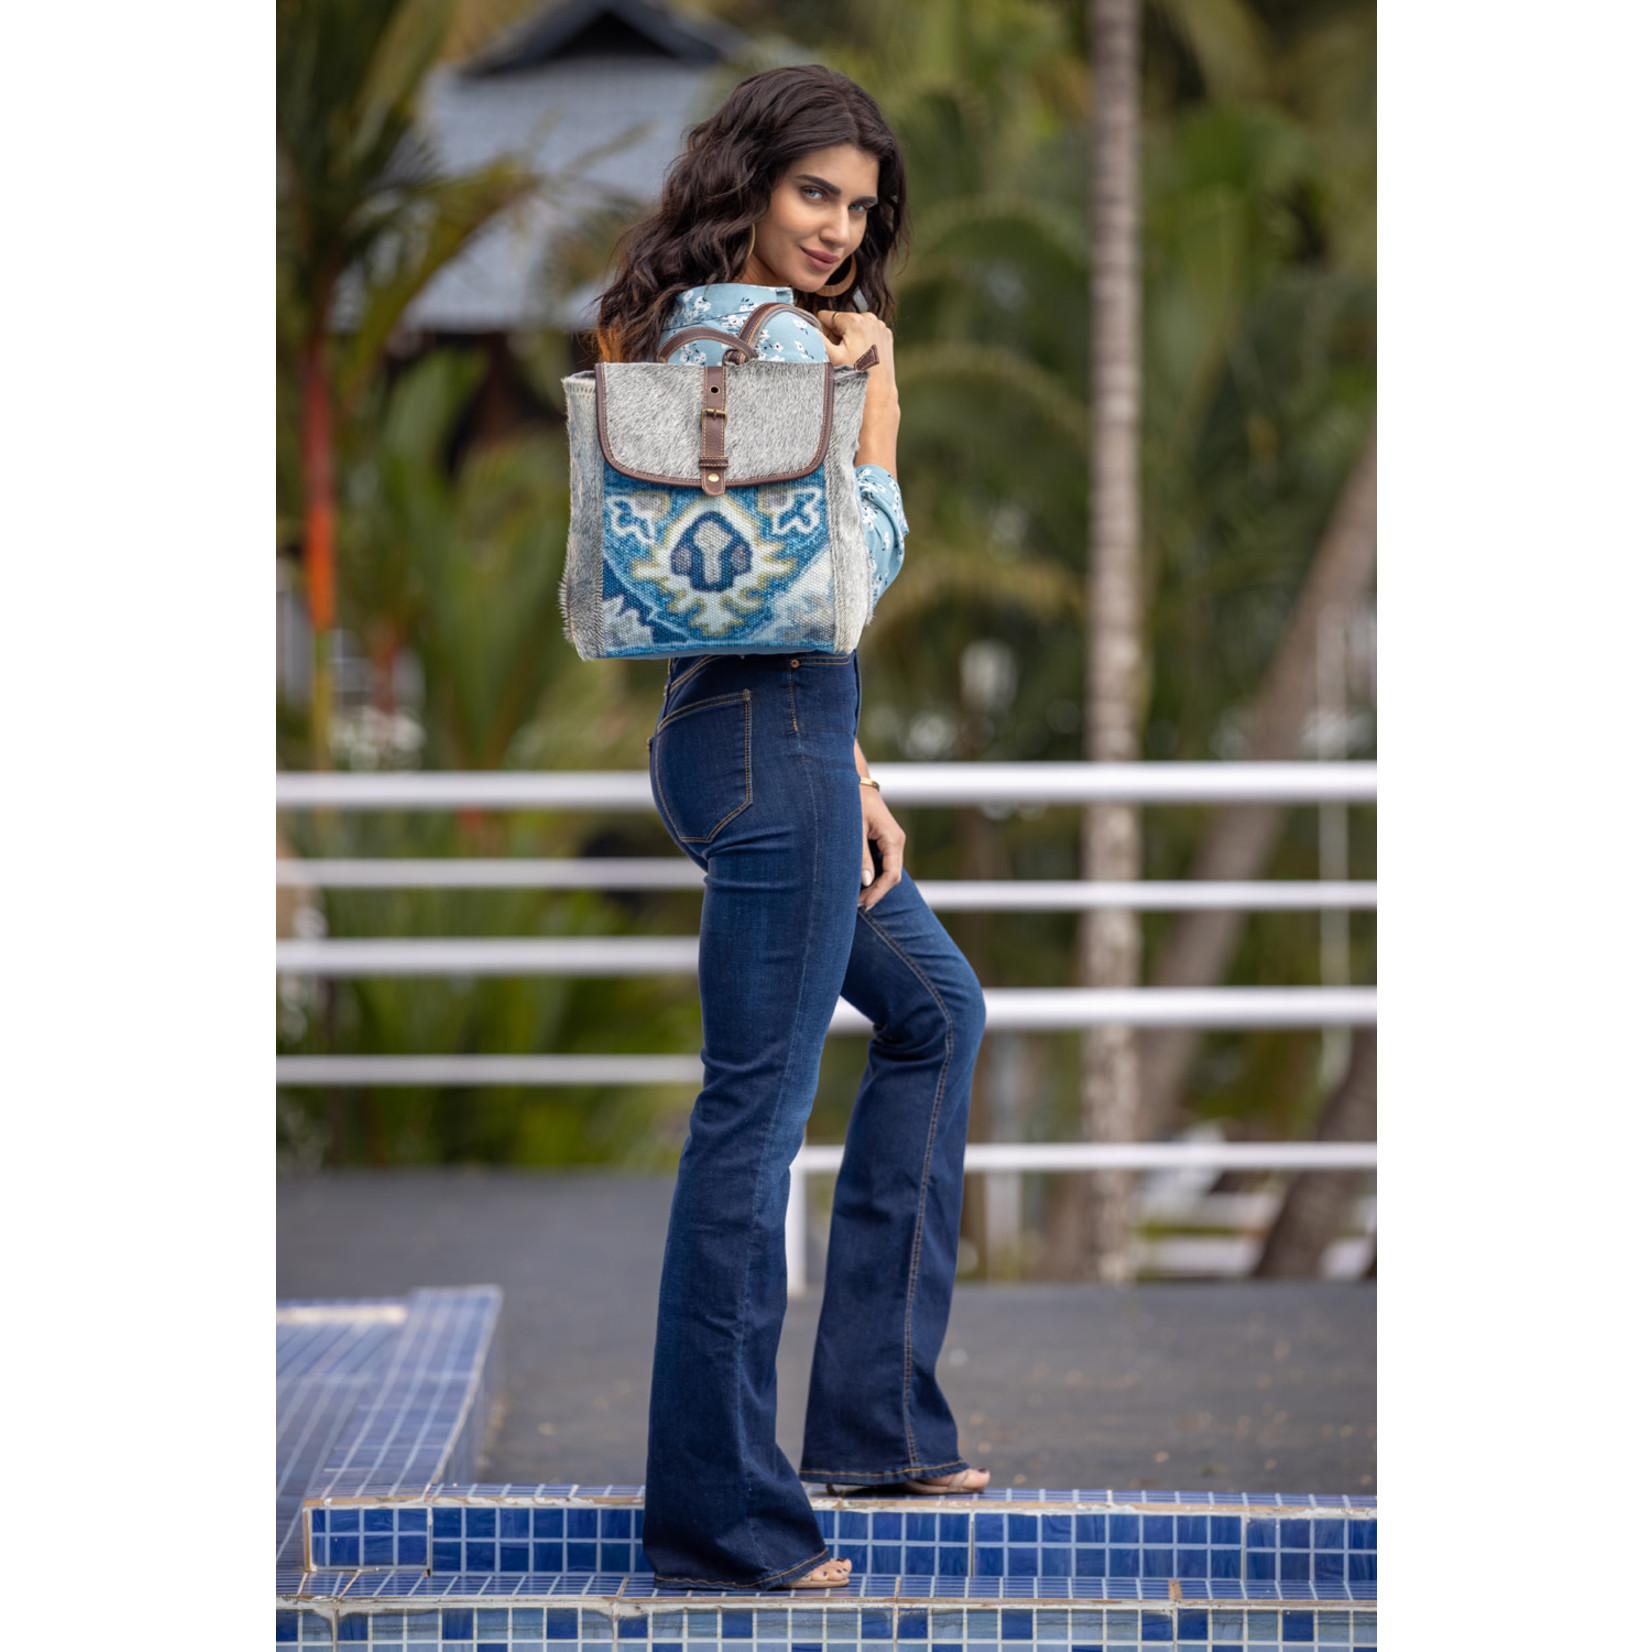 Myra Bags S-2220 Simple Backpack